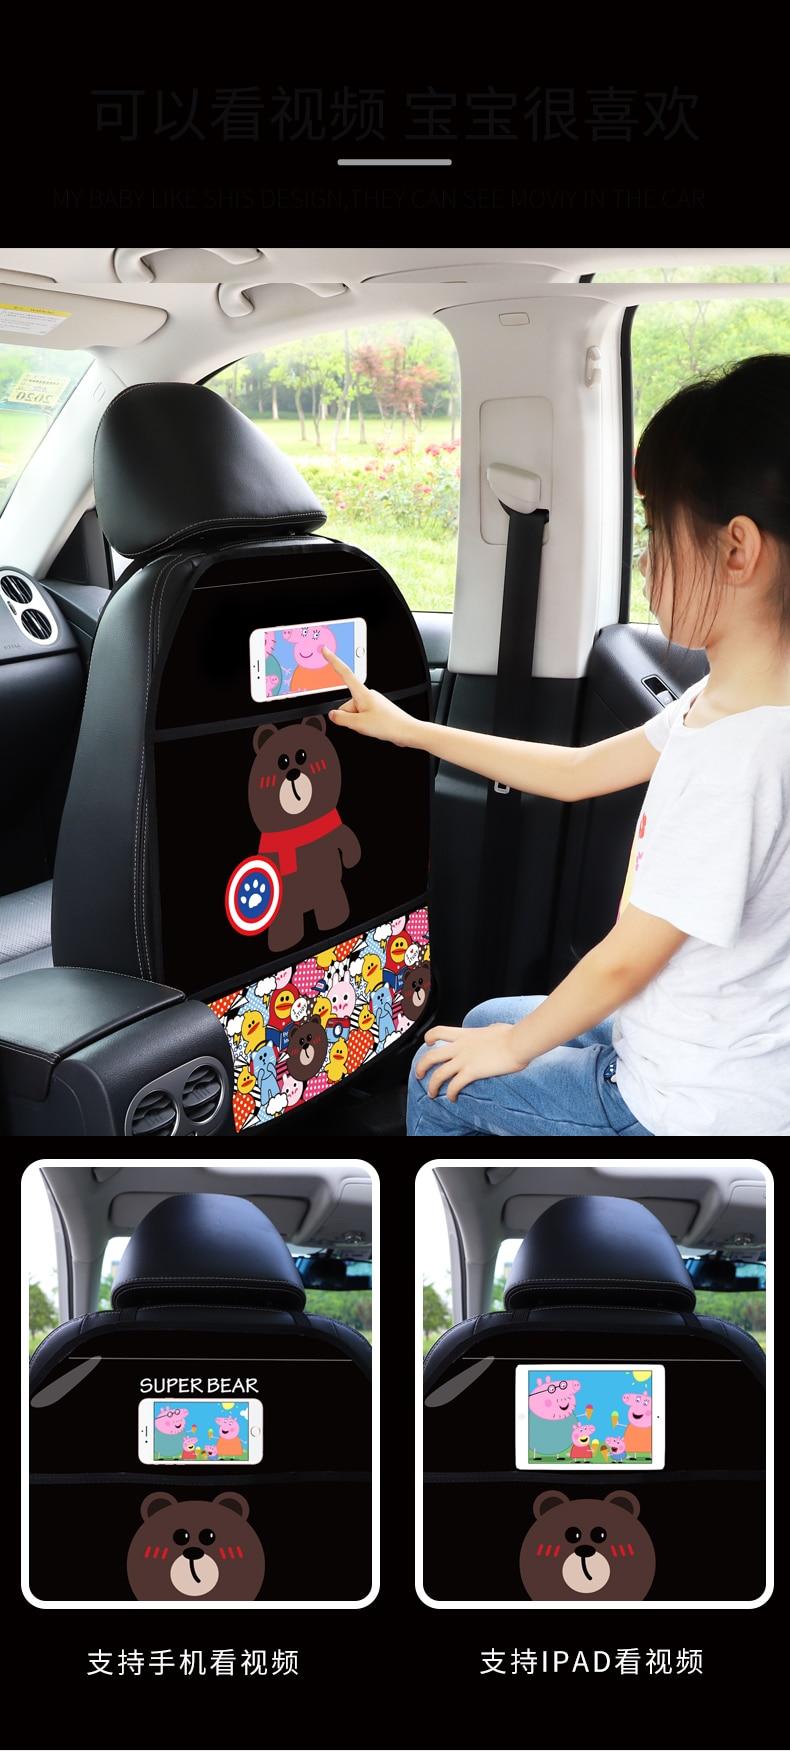 Children Anti-kick Mat for Automobile Anti dirt Mat for Car Front Seat Touch Screen Cute Car Seat Back Protectors Anti-kick mats